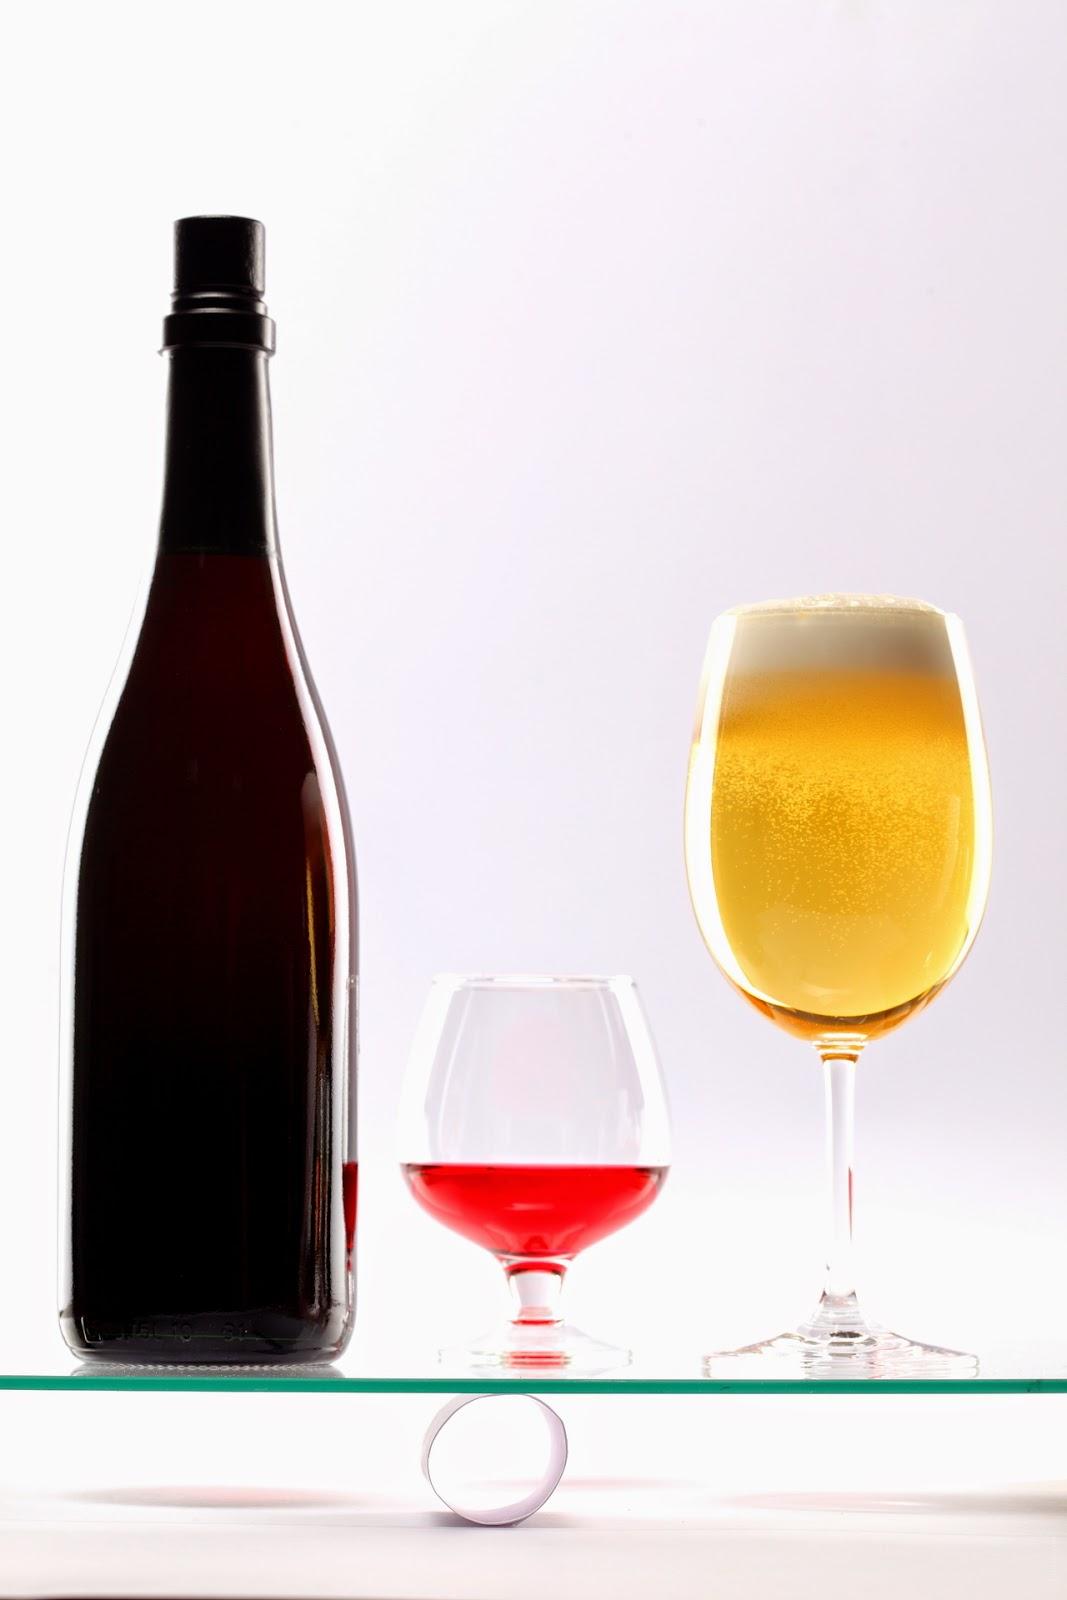 alcóol, bebida alcóolica, diabetes, cuidados, riscos, benefícios